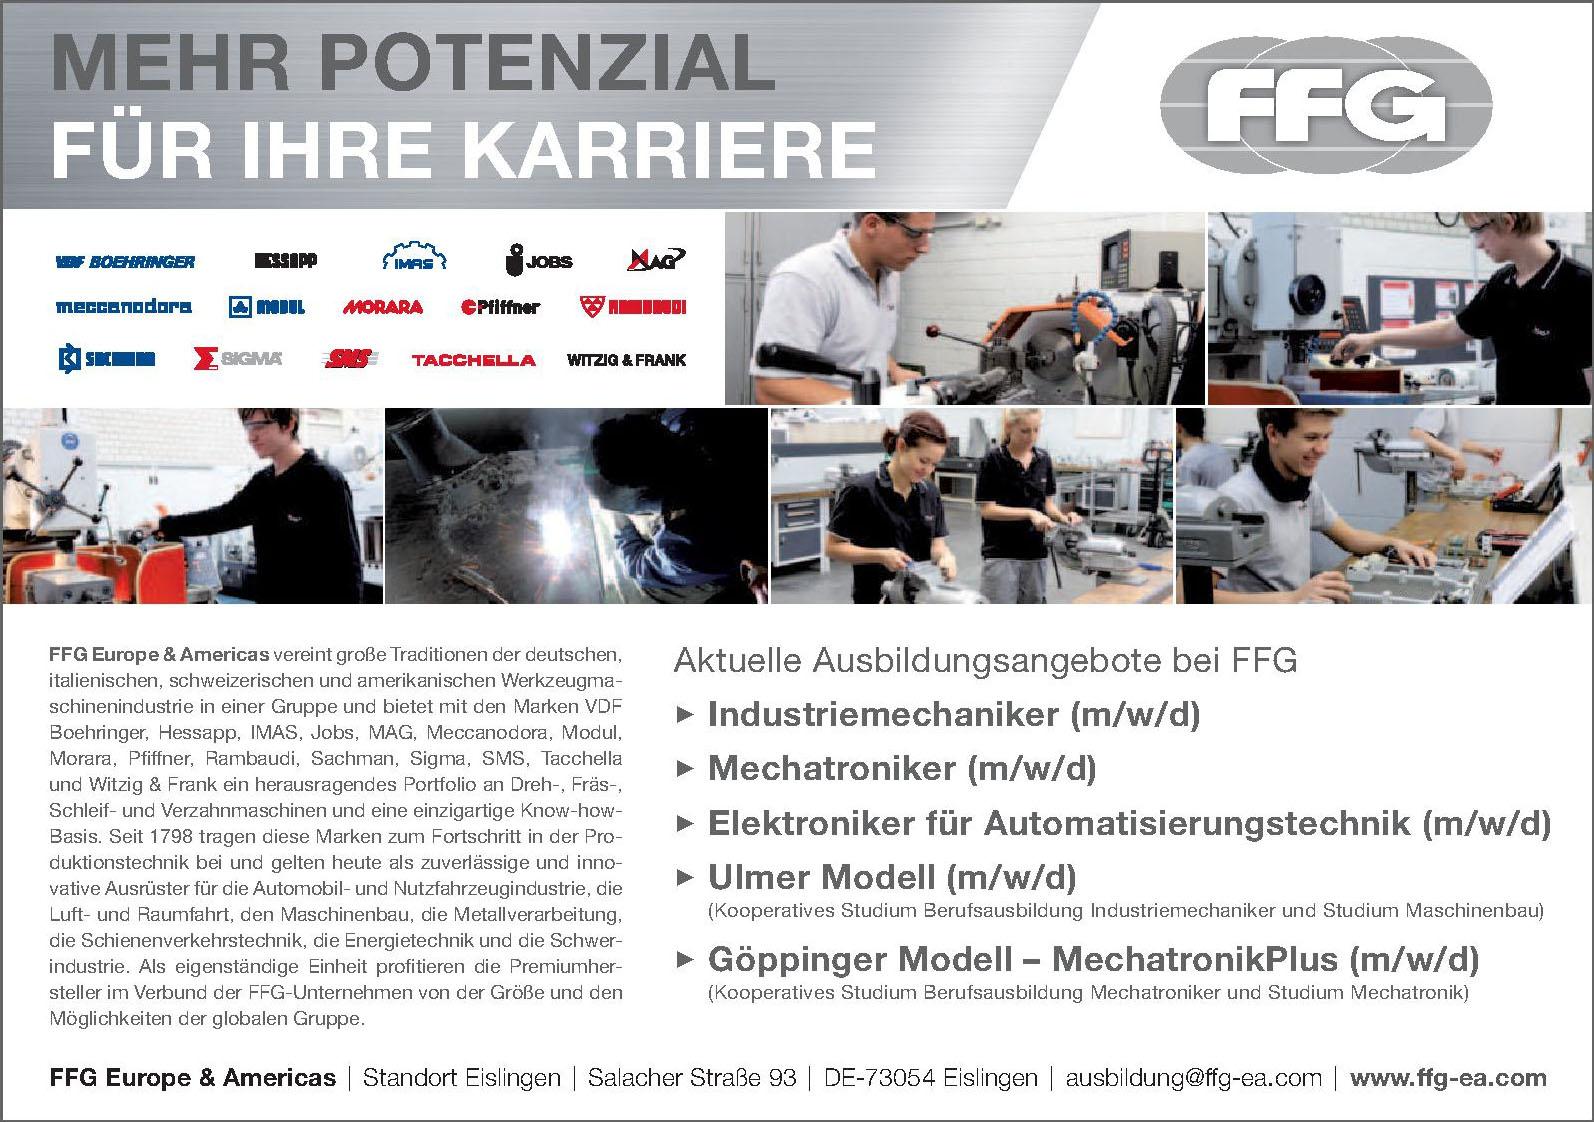 FFG Europe & Americas